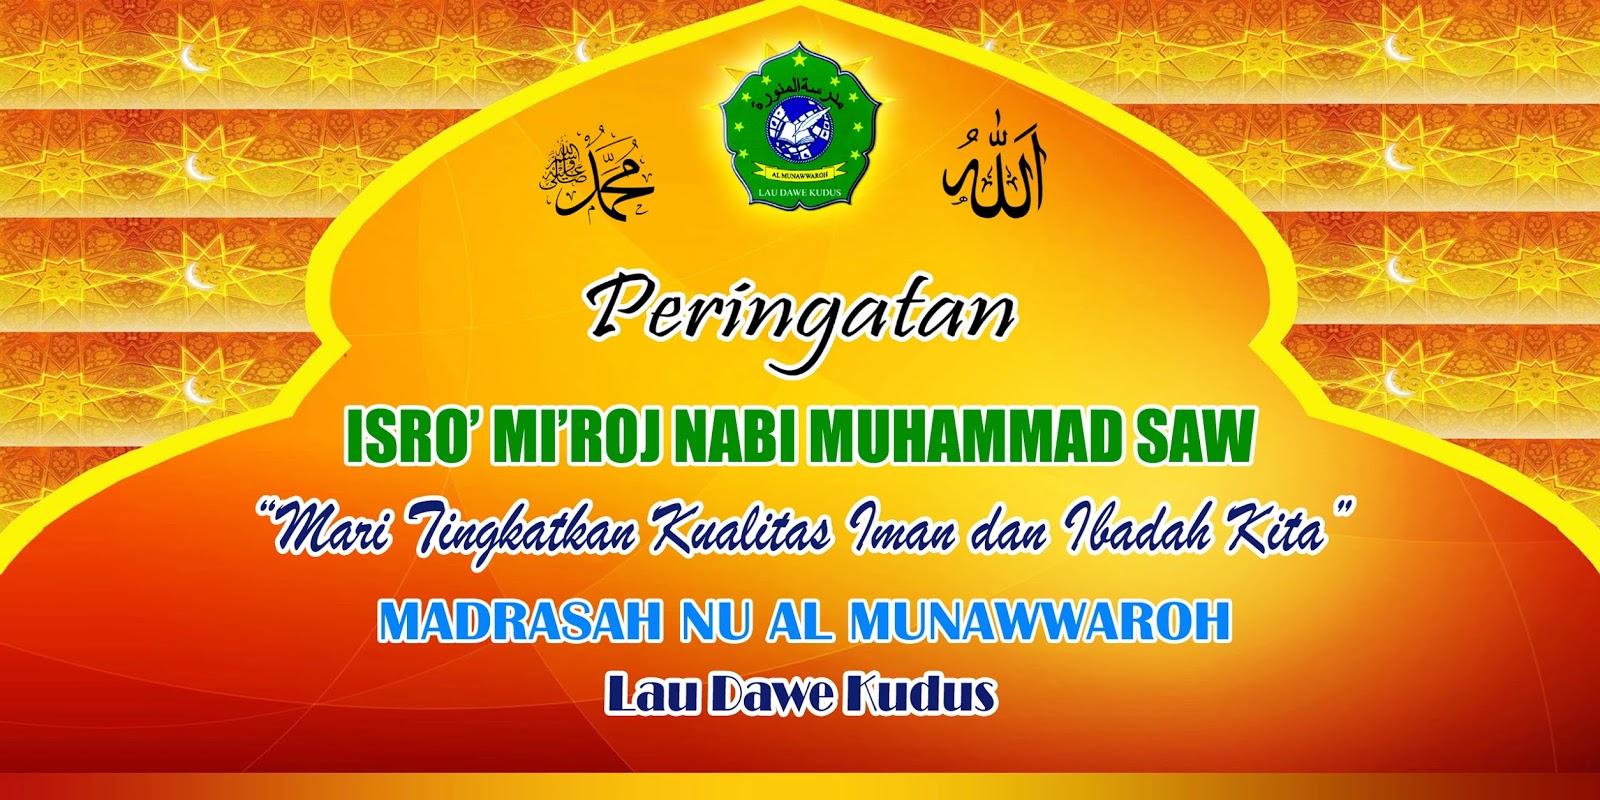 Desain Spanduk Dan Mmt Isro Mi Roj Nabi Muhammad Saw